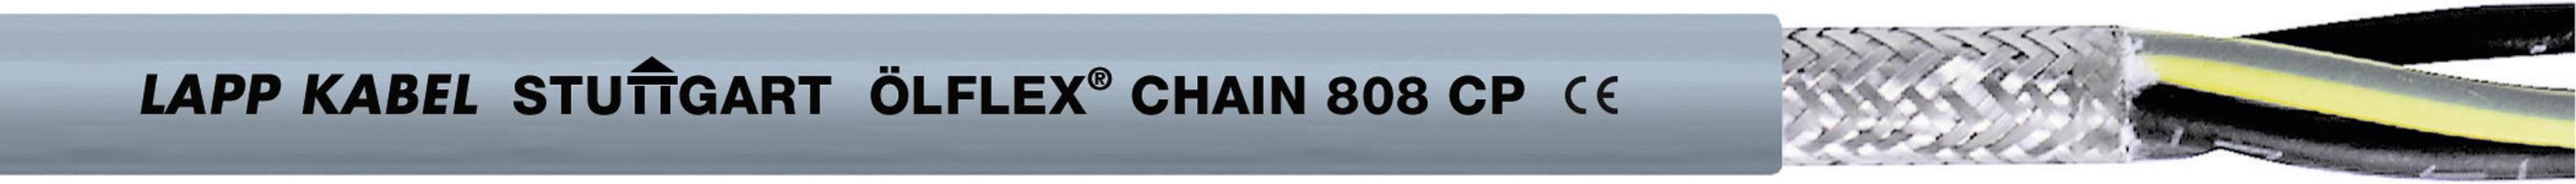 Žíla kabelu LappKabel ÖLFLEX CHAIN 808 CP 18G1,0 (1027773), 18x 1 mm², polyurethan, Ø 14 mm, stíněný, 50 m, še